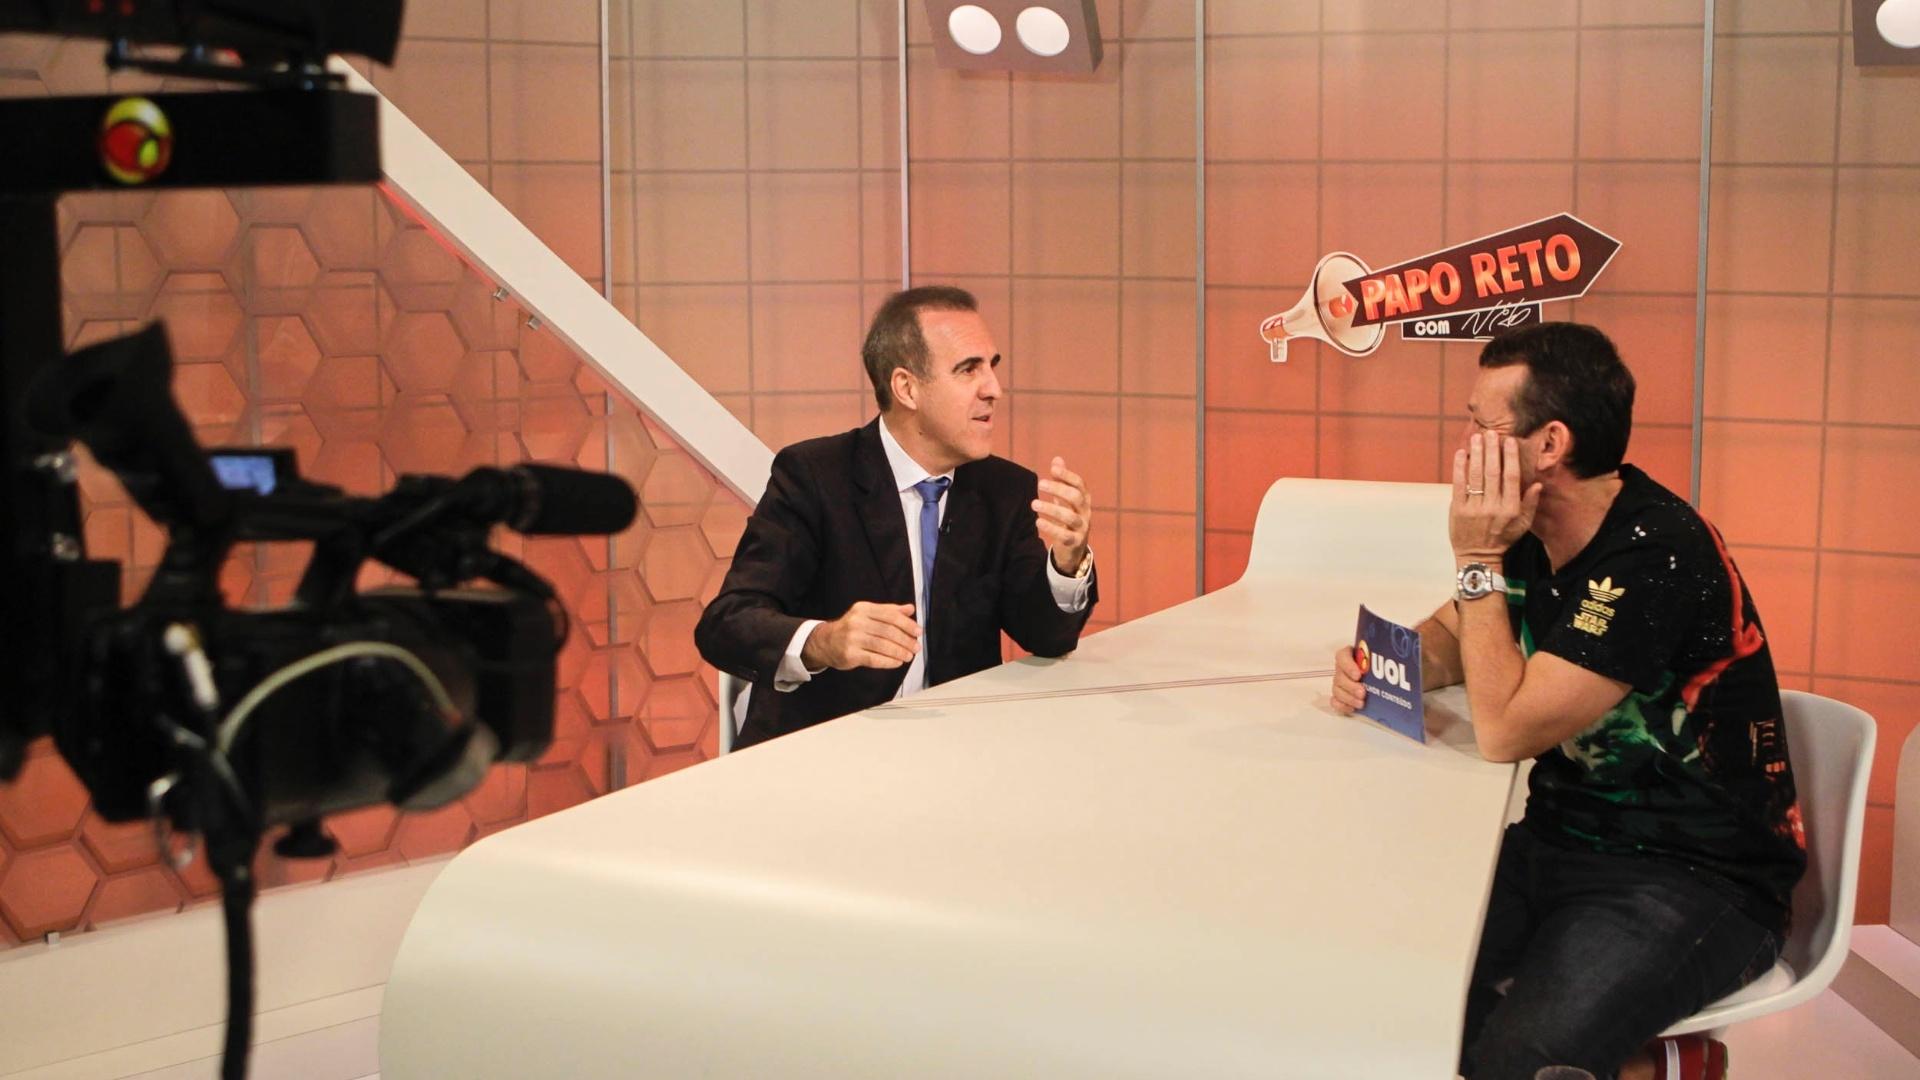 Neto entrevista Wagner Ribeiro para o programa Papo Reto, do UOL